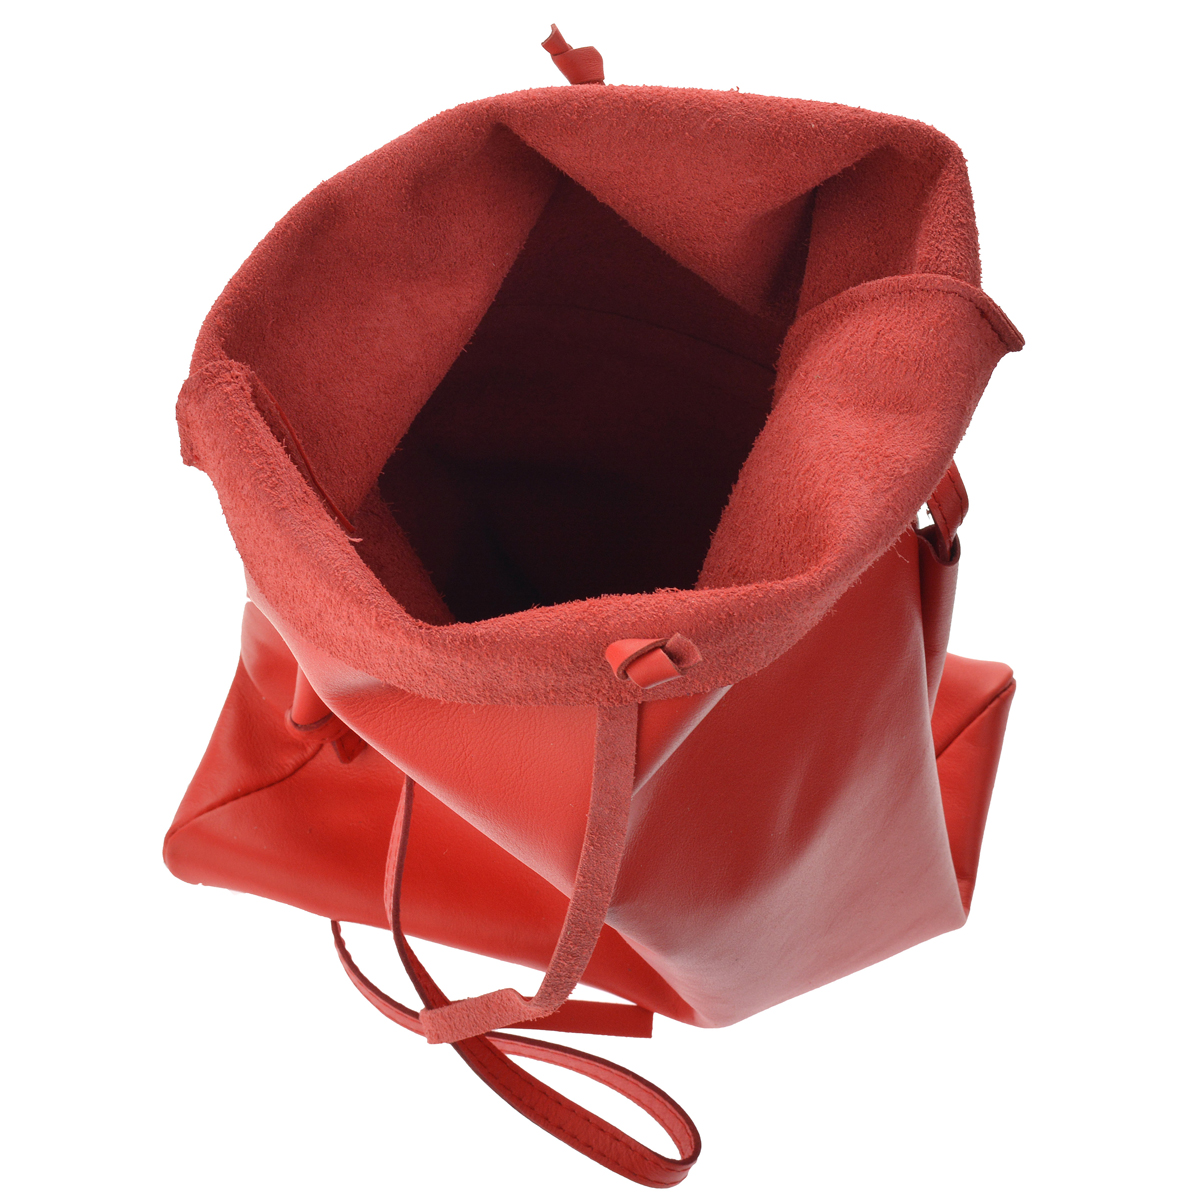 Dámská kožená kabelka FACEBAG NICOLA - Korálová